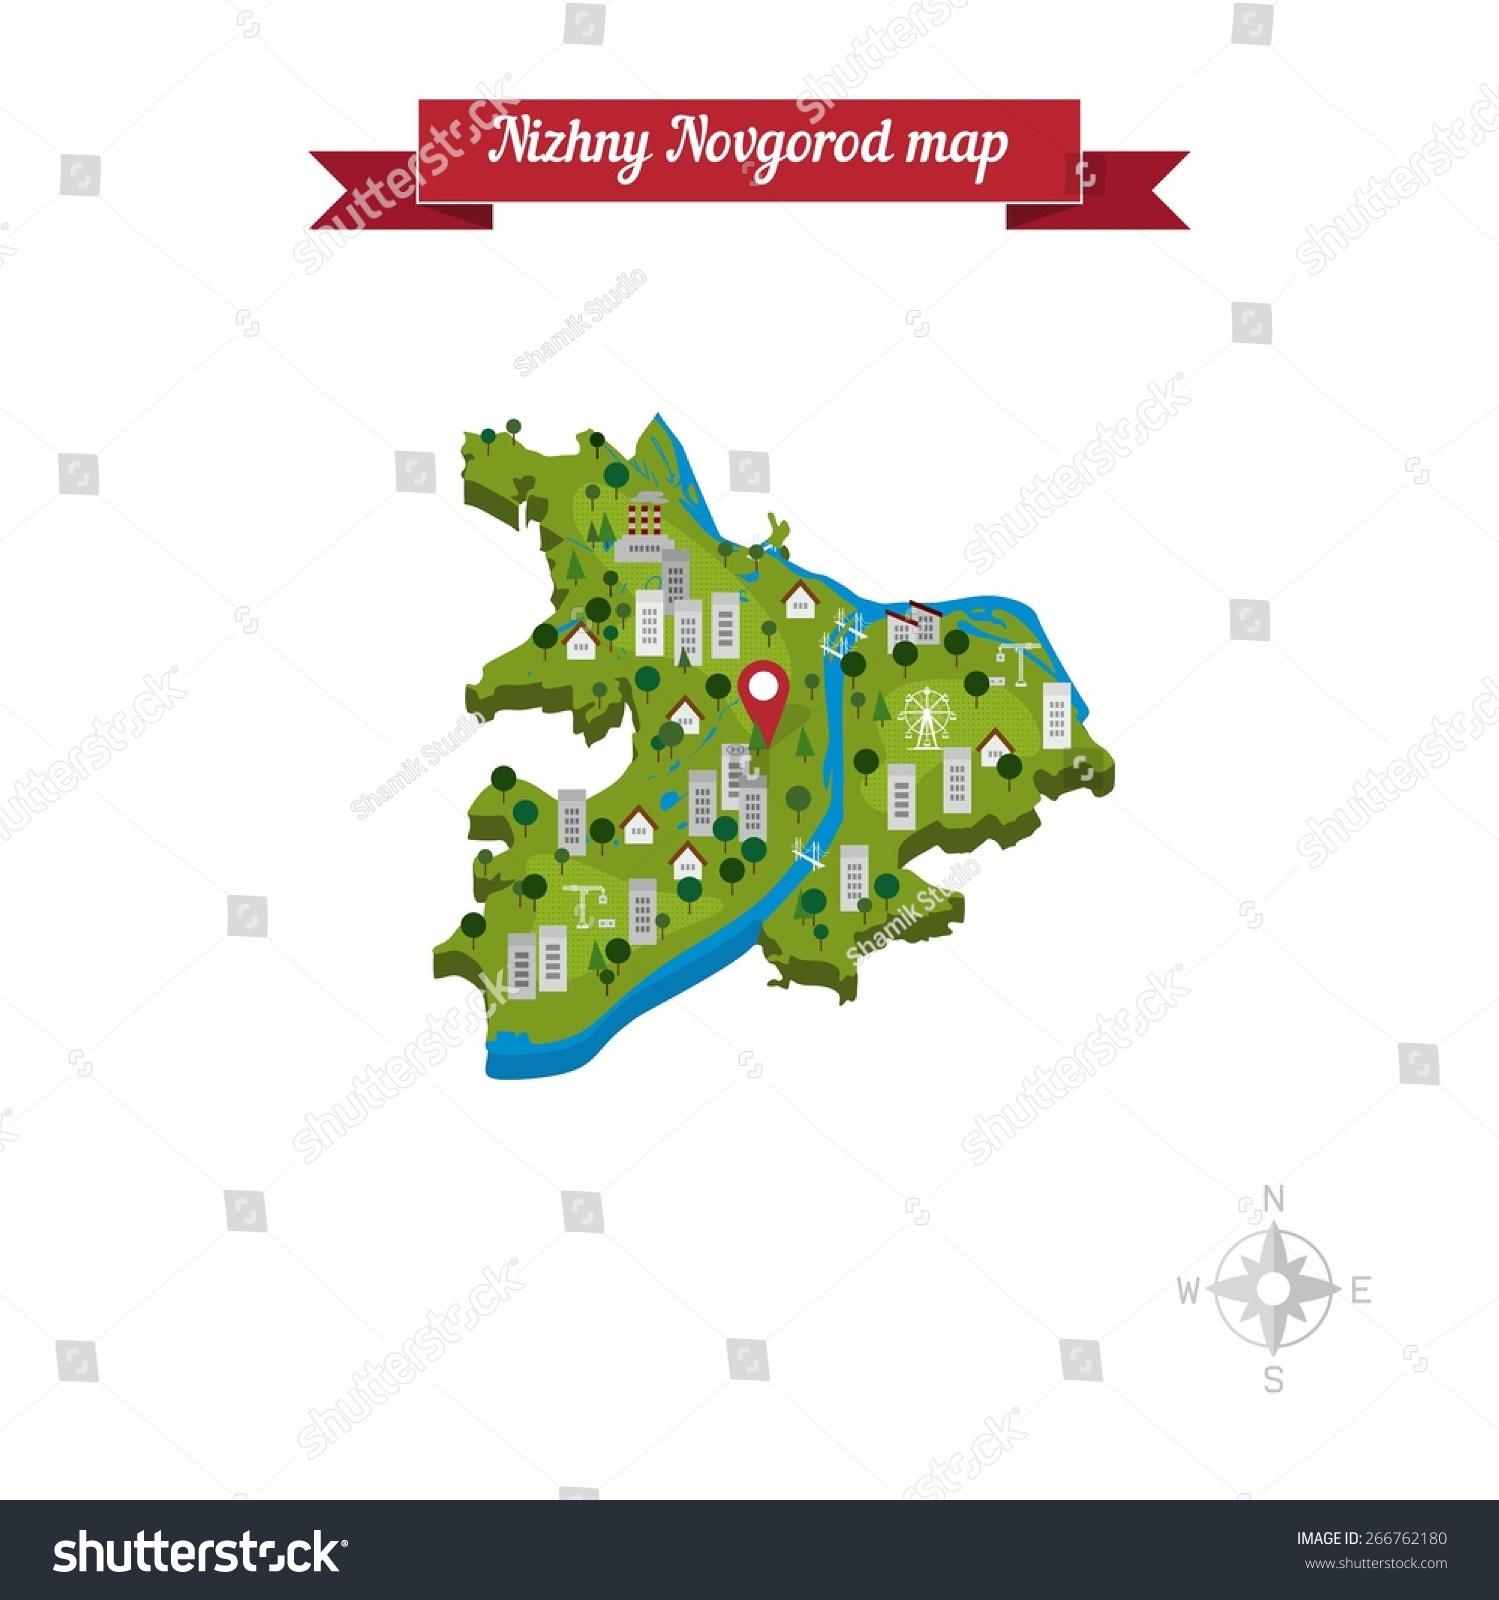 Street map Novgorod Russia